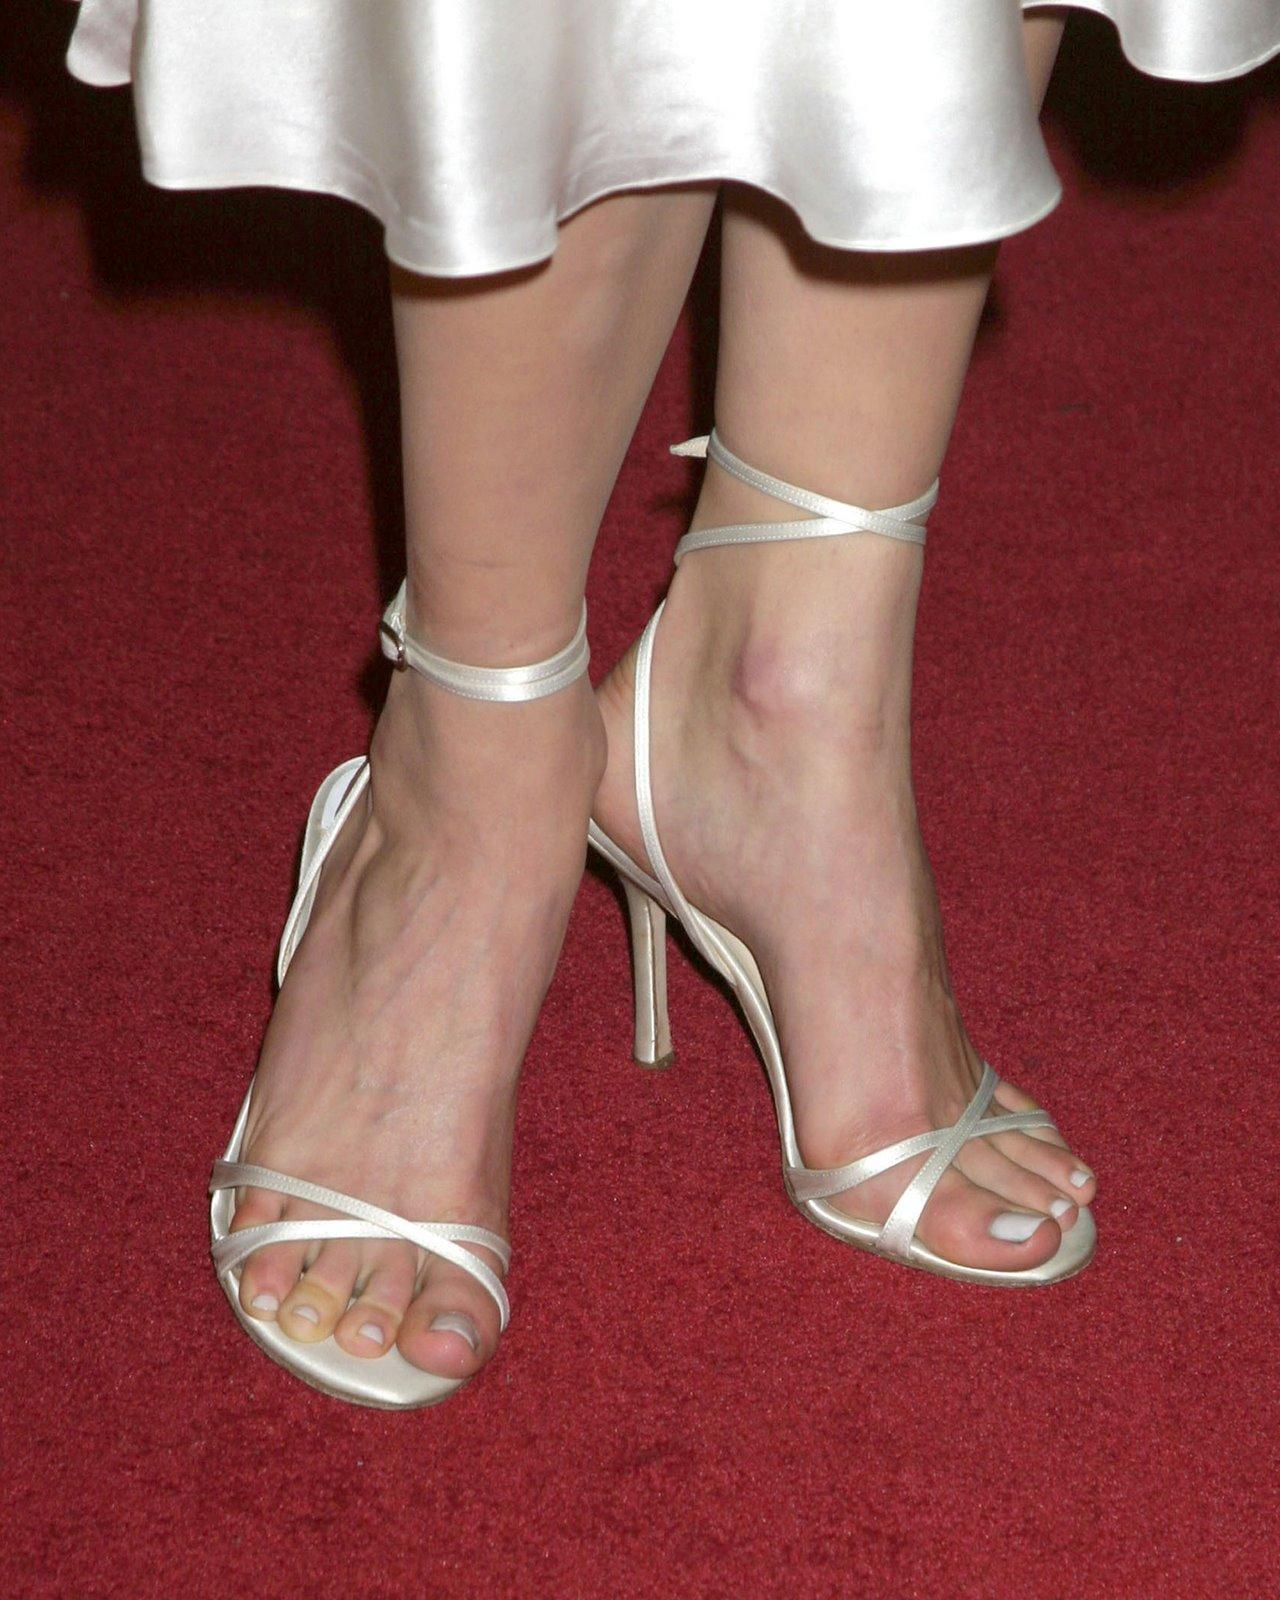 http://2.bp.blogspot.com/_UaLWp72nij4/S7zkW7IUCLI/AAAAAAAAGo4/VxKX1IzDQLo/s1600/emmy-rossum-feet-2.jpg